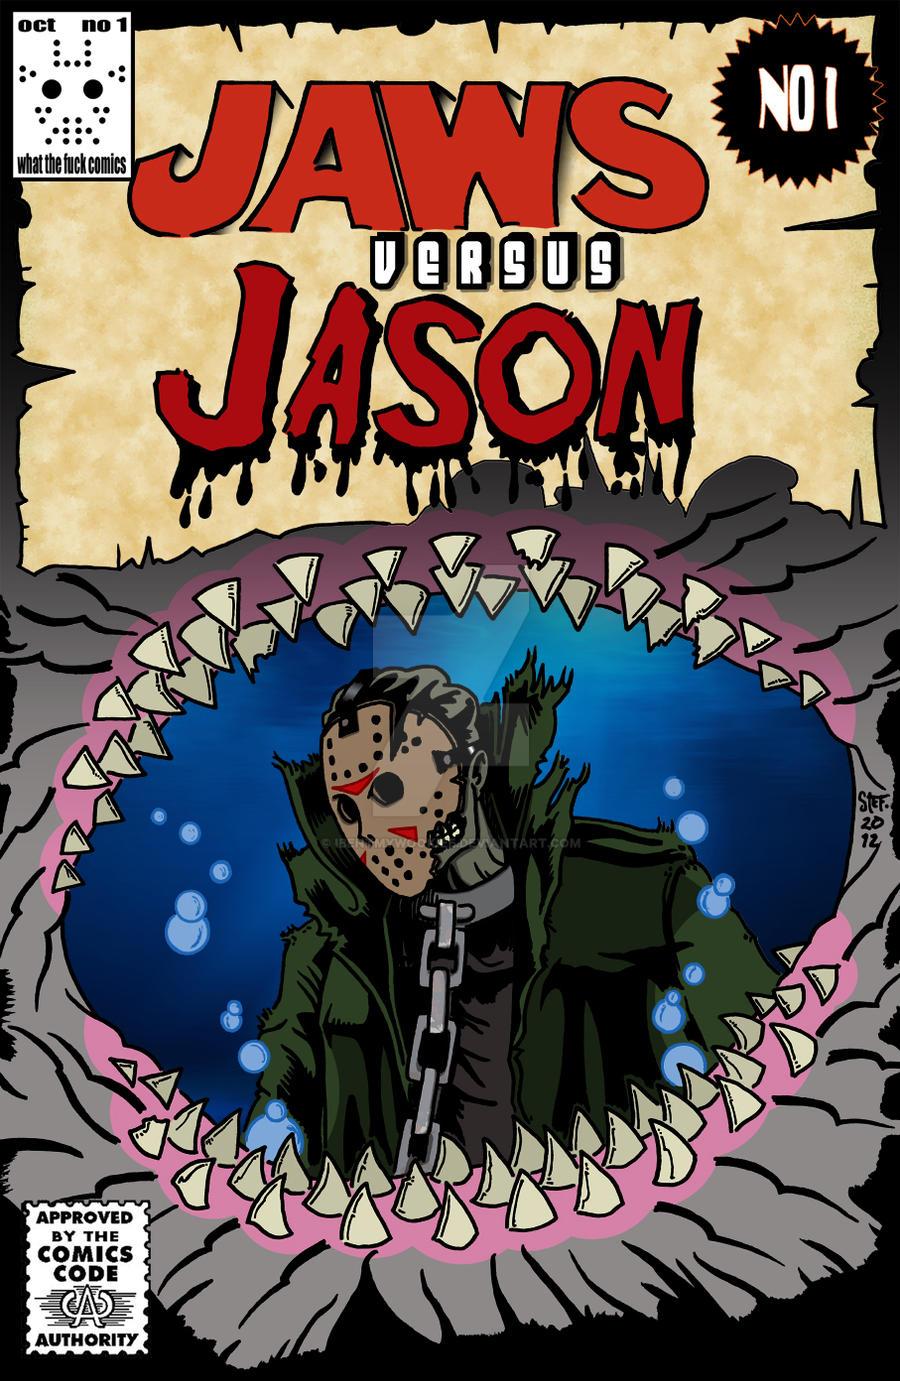 jason versus jaws comic book by ibentmywookiee on deviantart